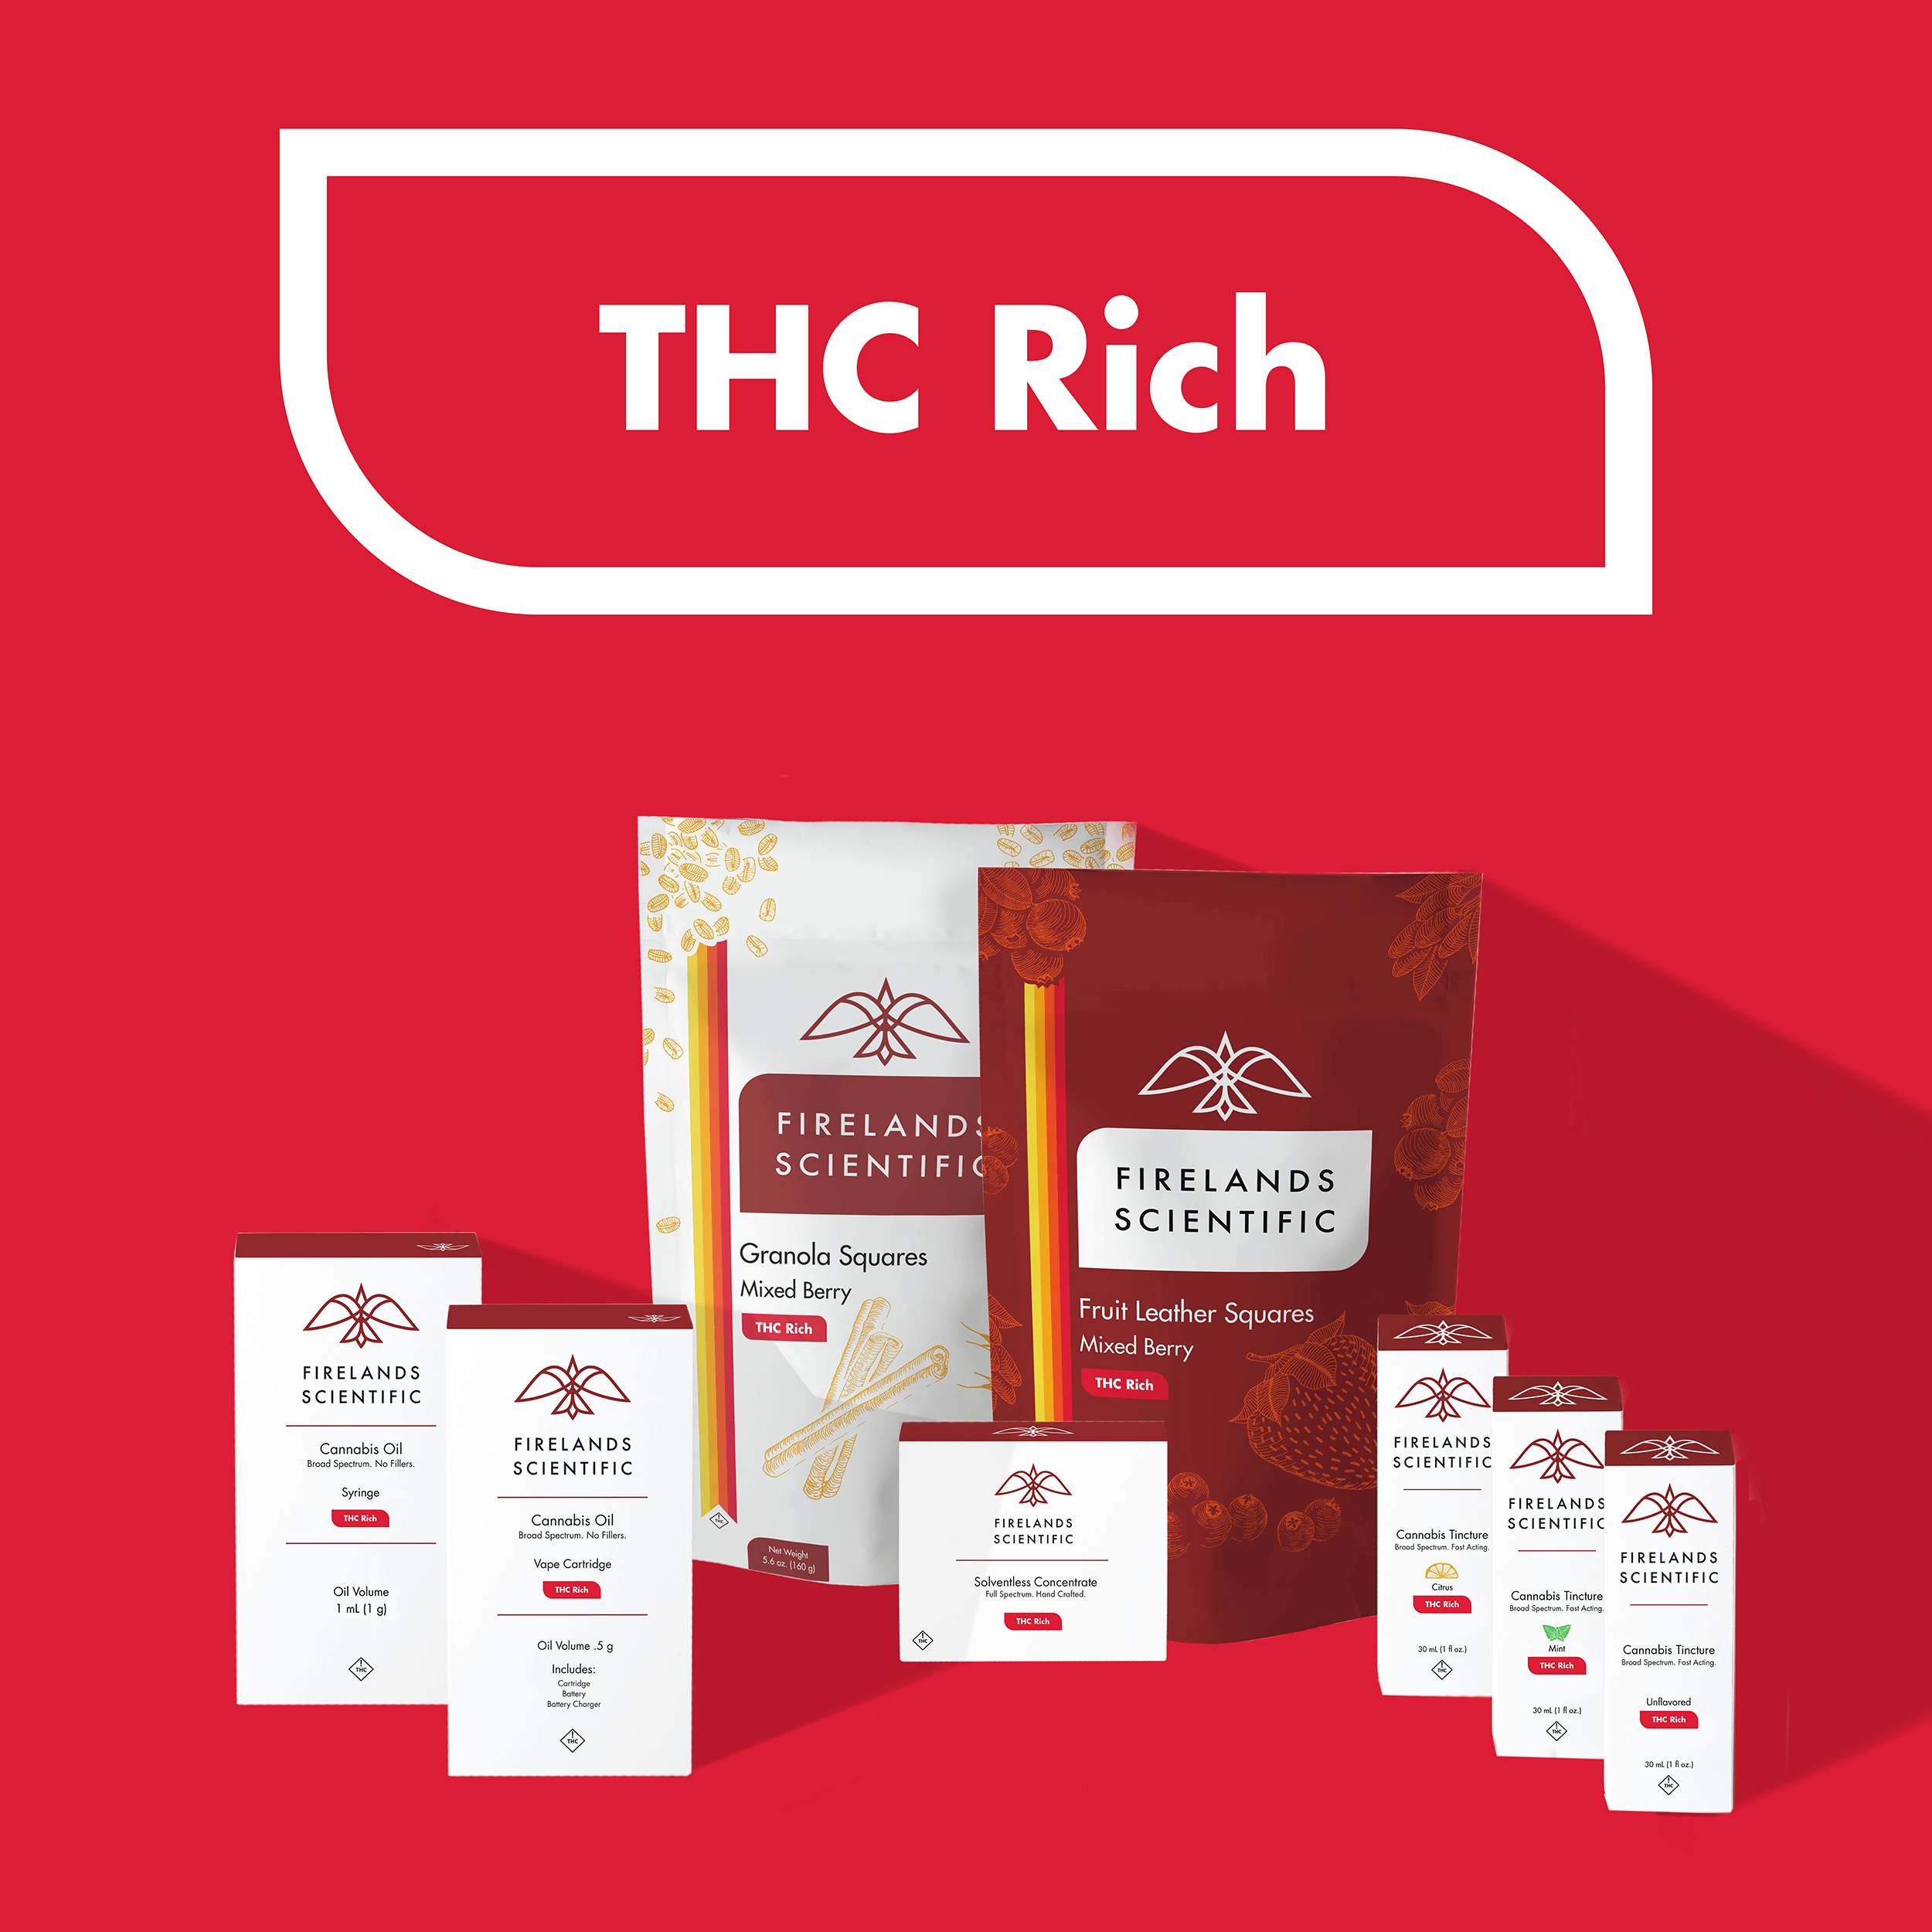 THC Rich